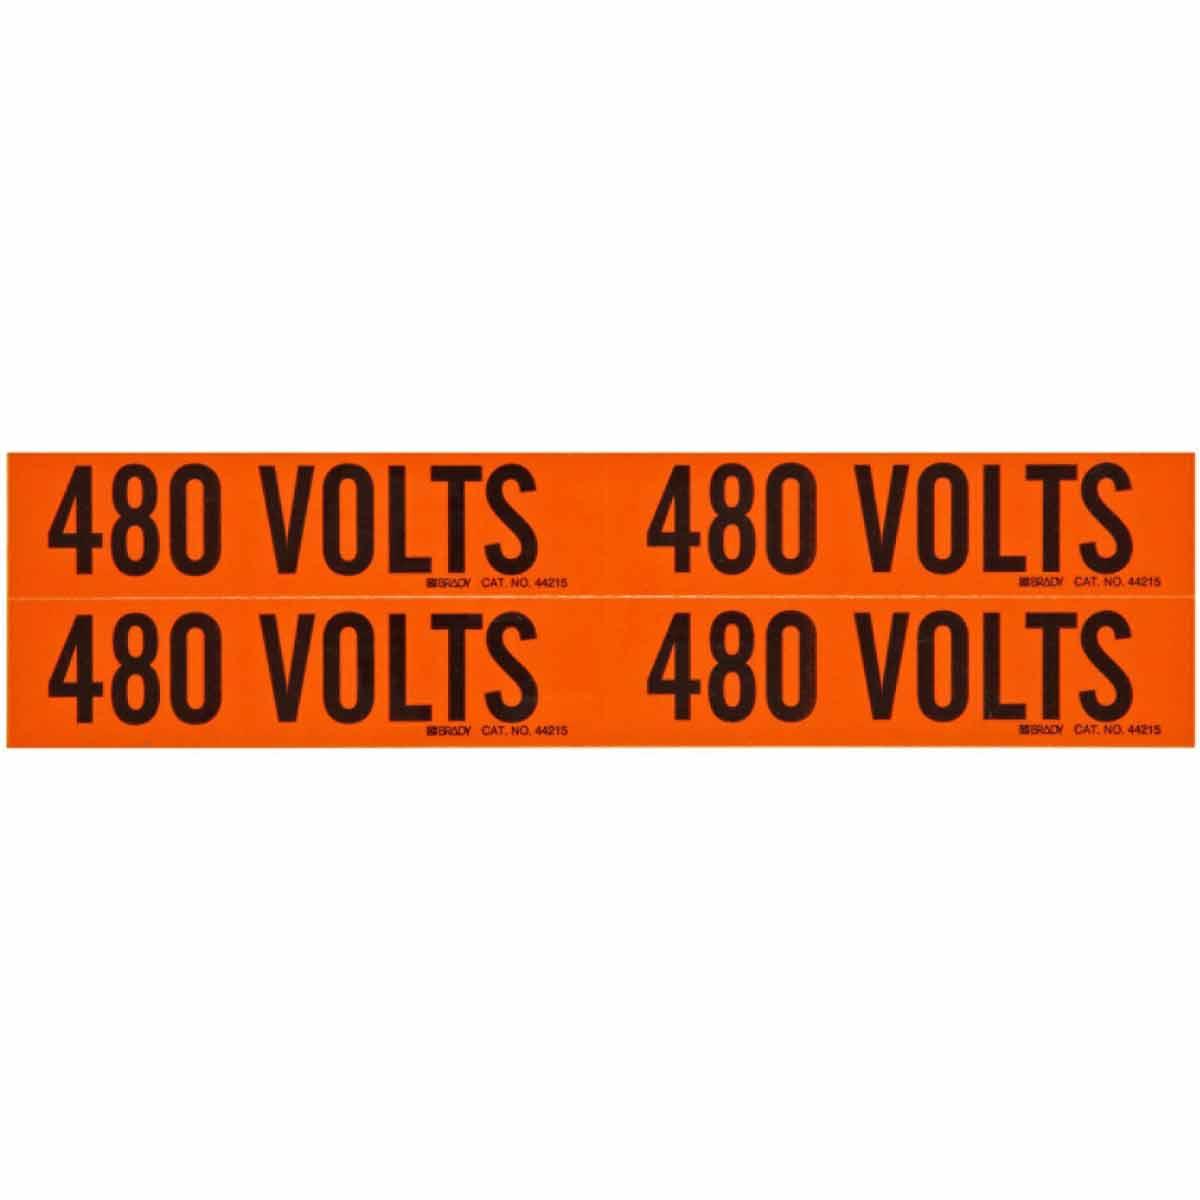 BRADY 44215 Conduit & VoltageMarker 480 Volts